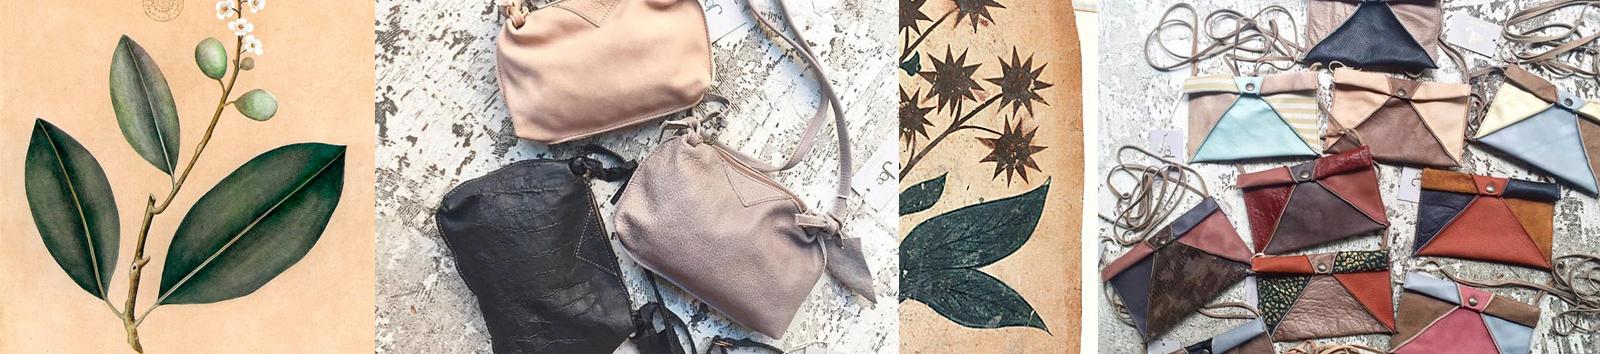 Contact Jee Bags – Jee Bags, unique handmade leather bags, unieke handgemaakte leren tassen, Janneke Peters